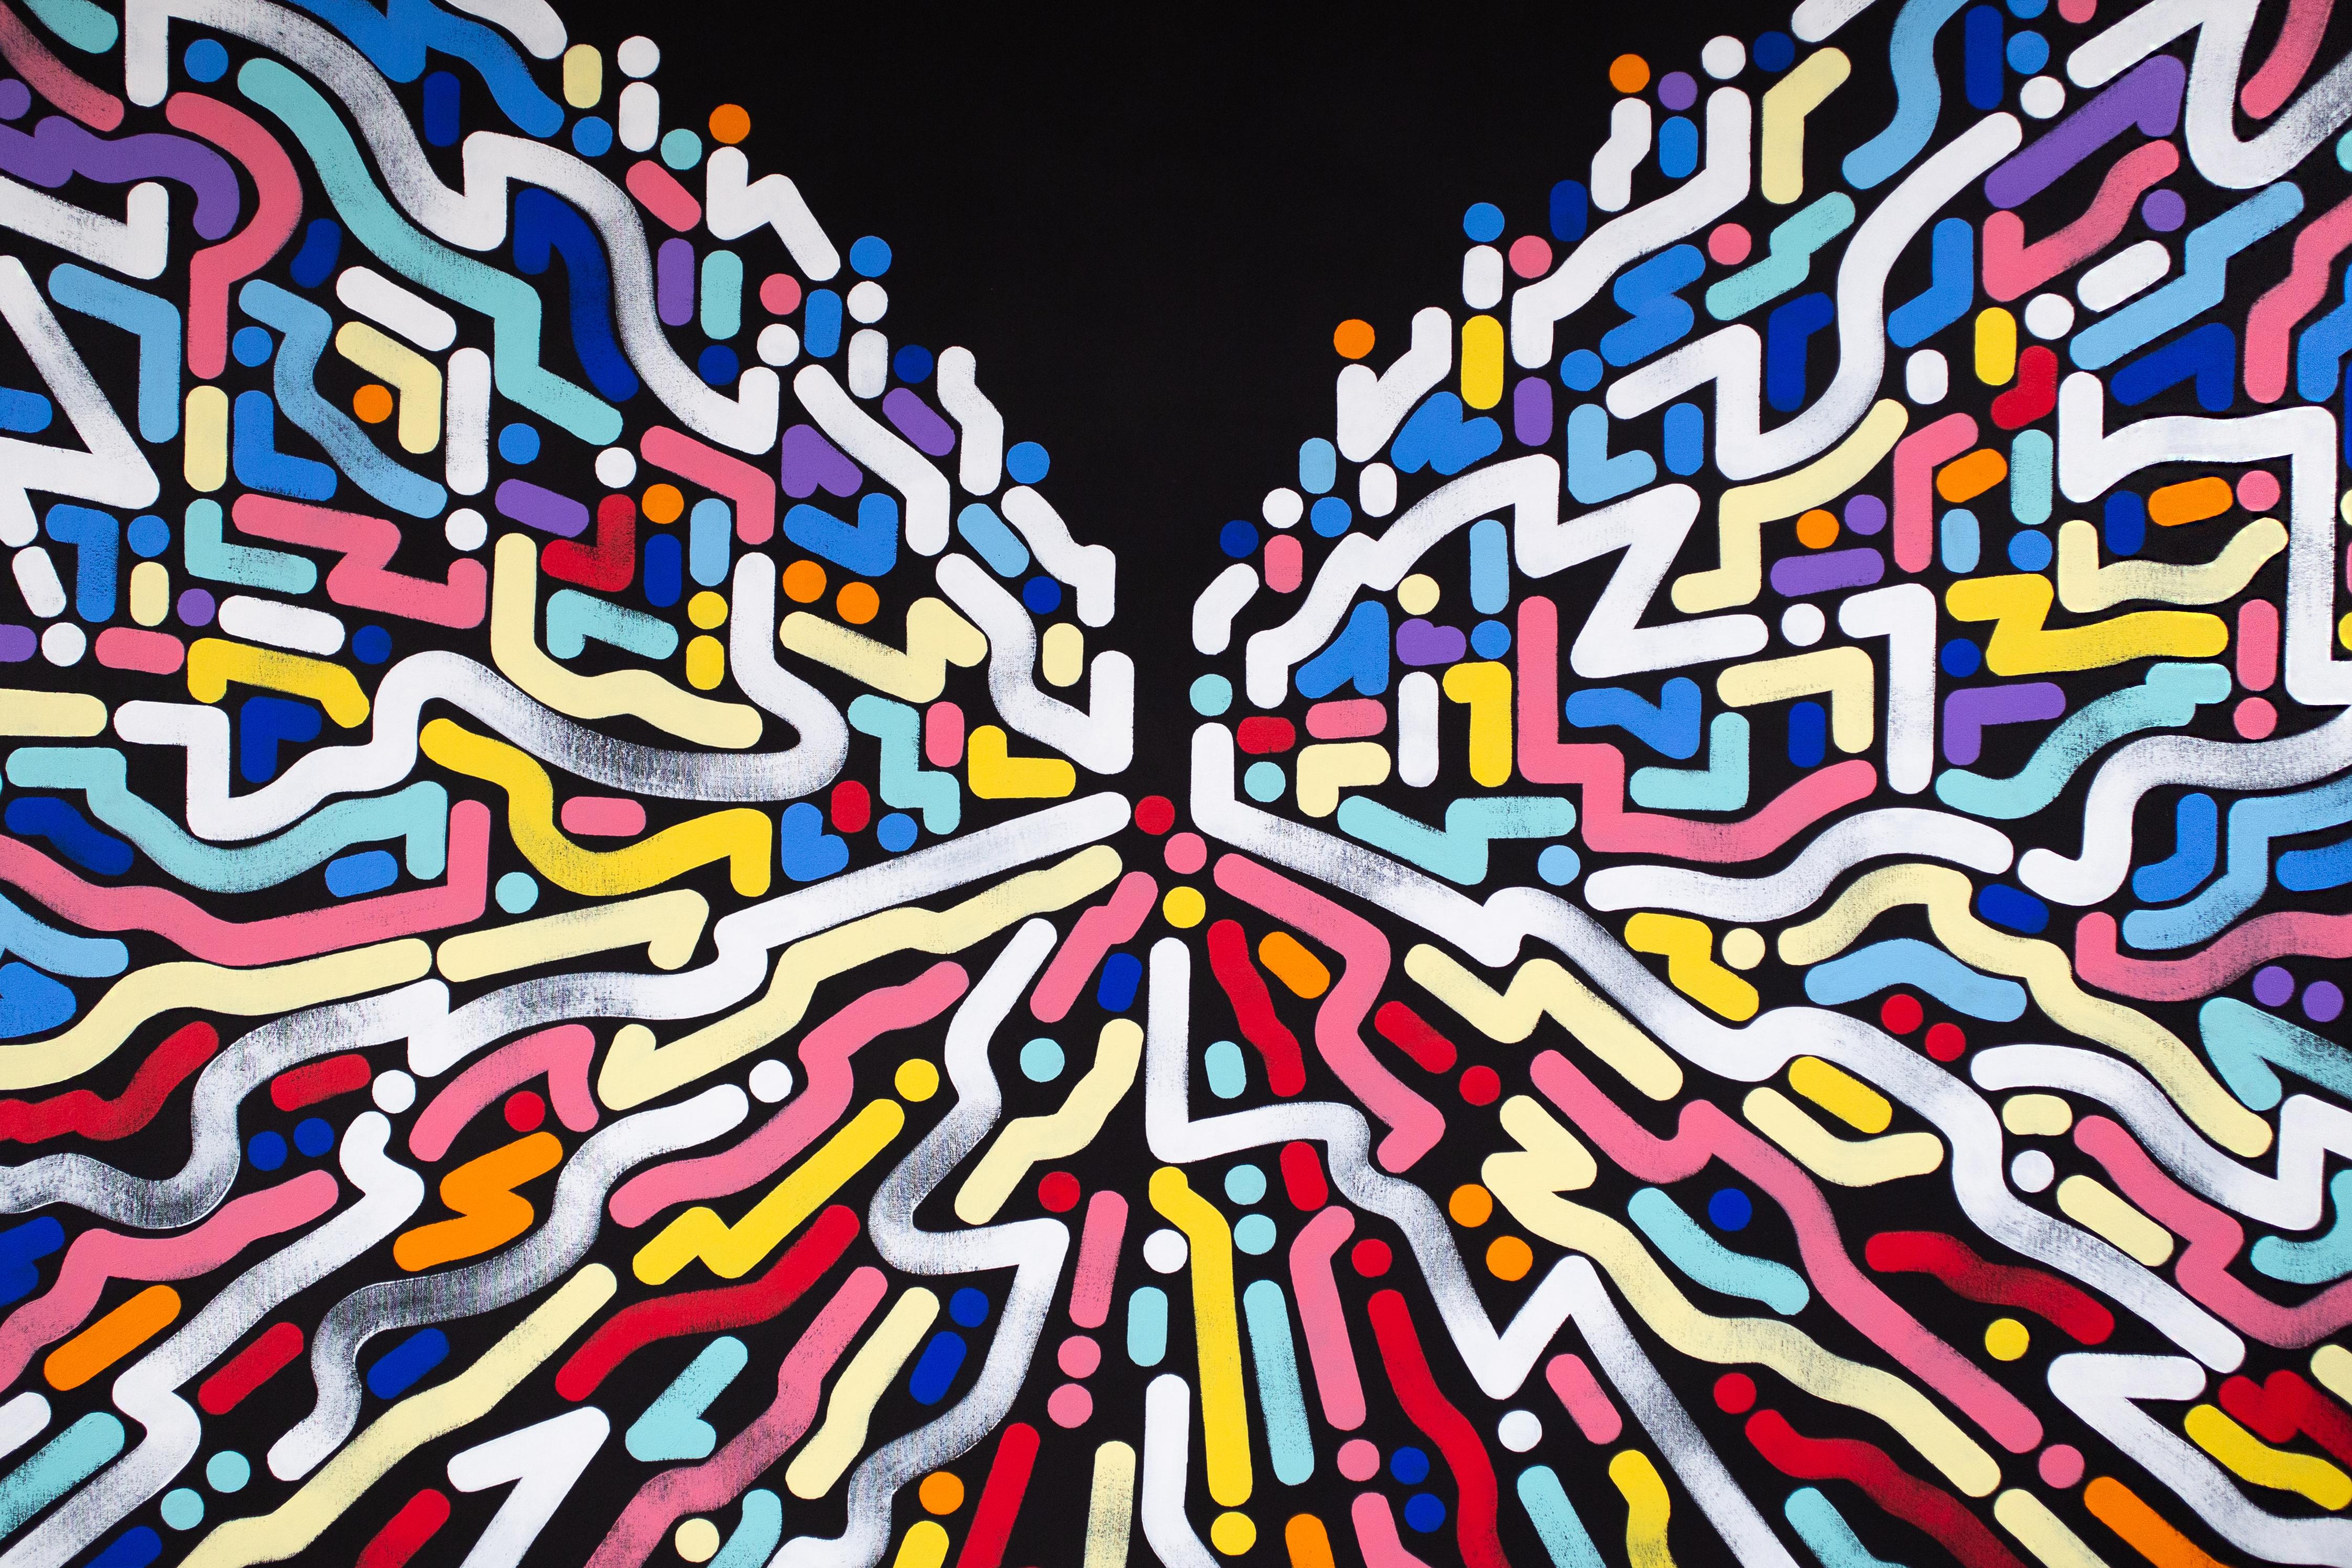 Yoon Hyup, Innervisions, 2019, acrylic on canvas, 152×102 cm